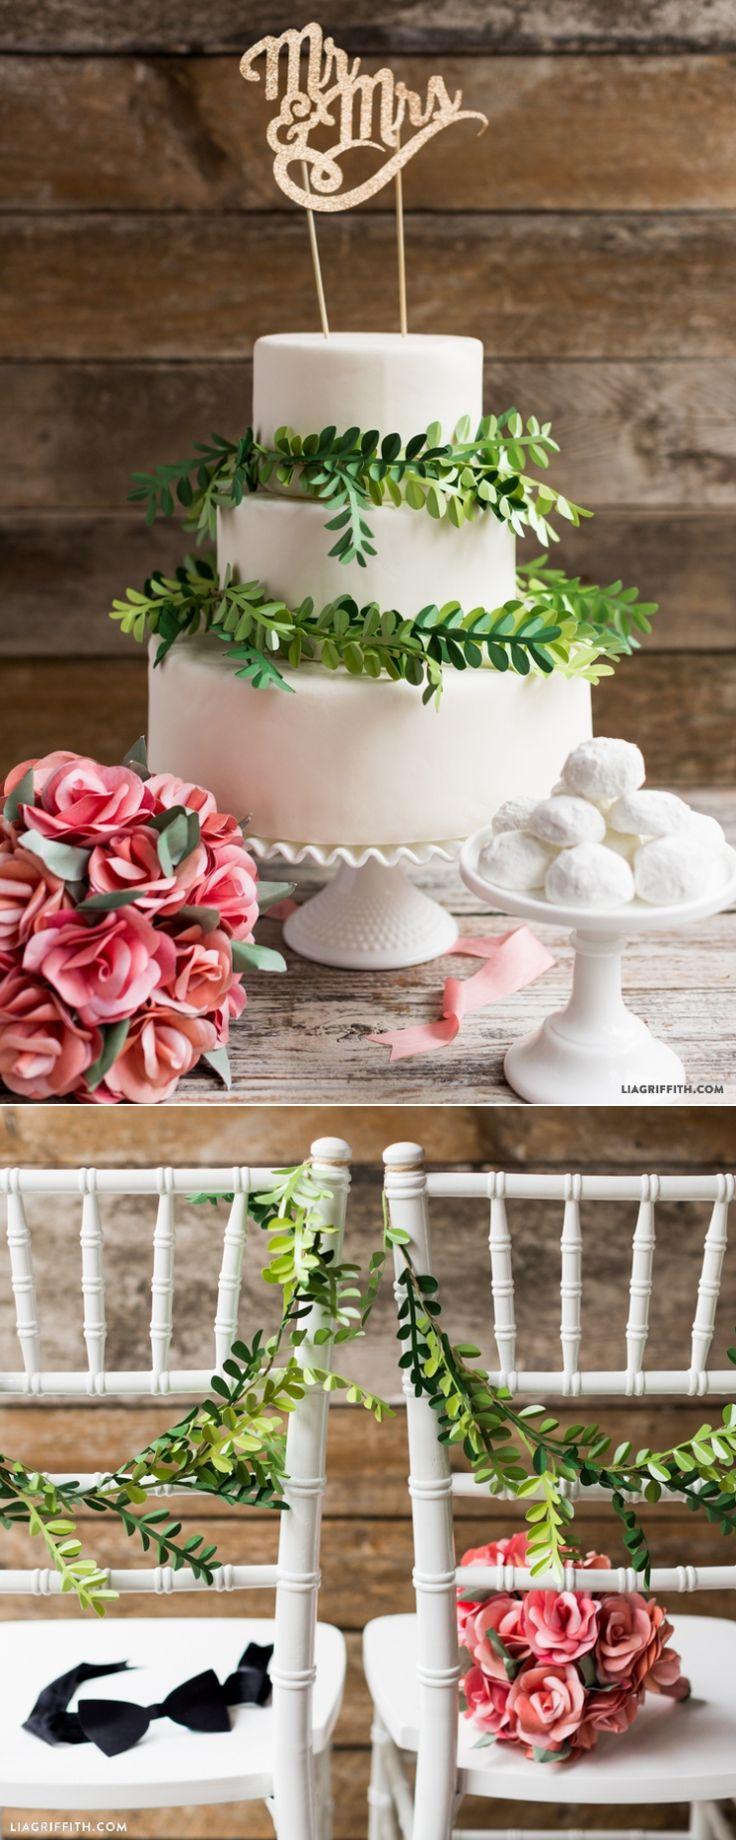 Paper Boxwood DIY Wedding Decorations | Diy wedding ...